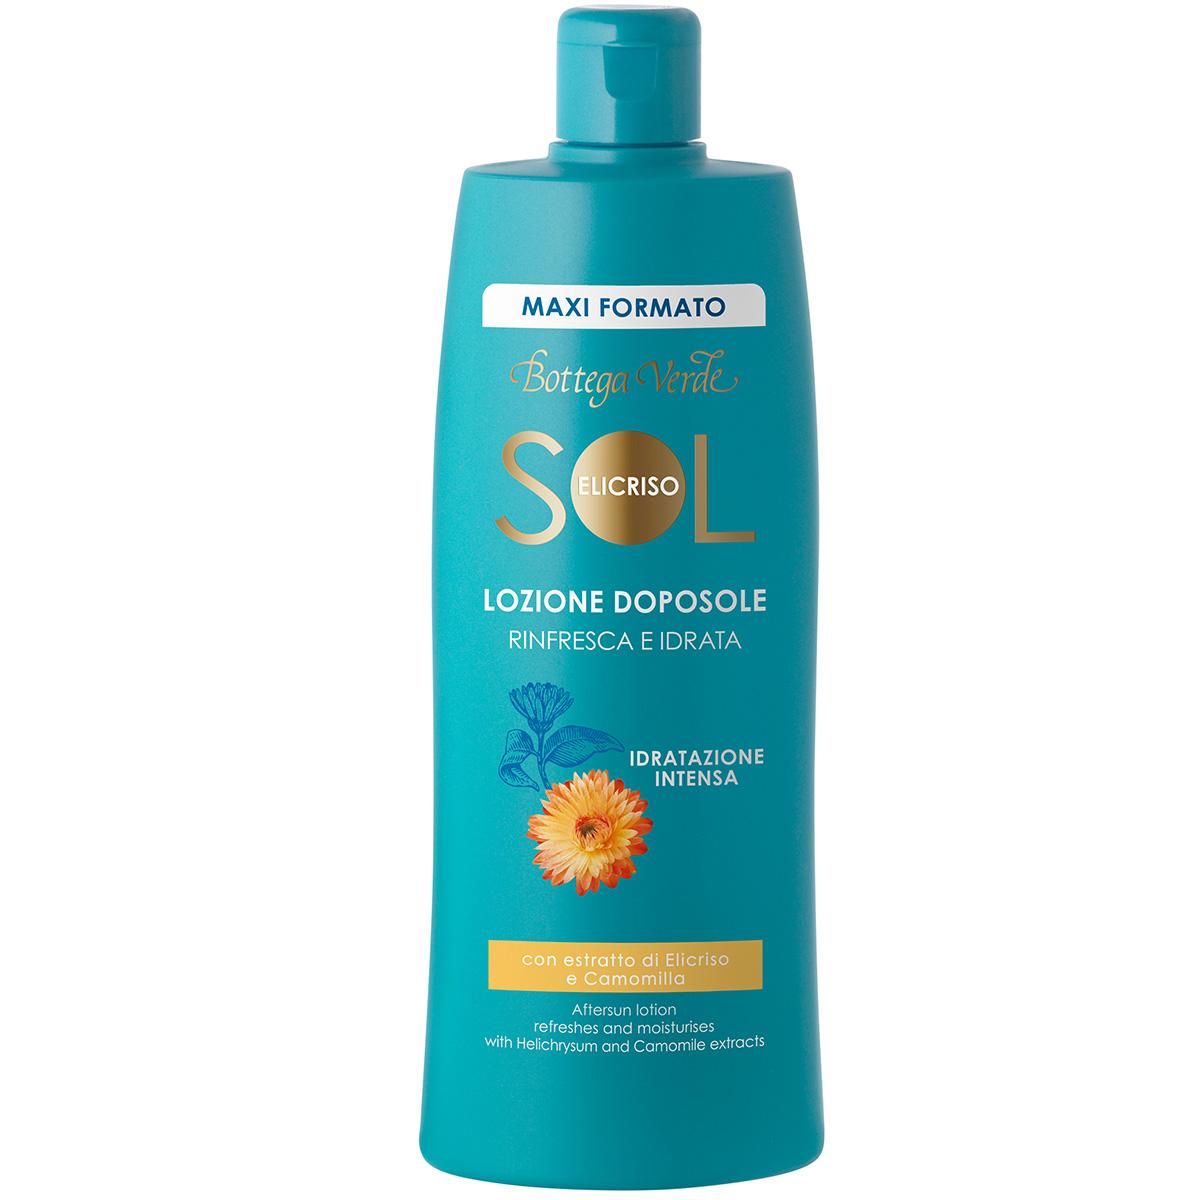 Protectie Solara - Lotiune dupa plaja - reimprospateaza si hidrateaza - cu extract de Helichrysum si Musetel